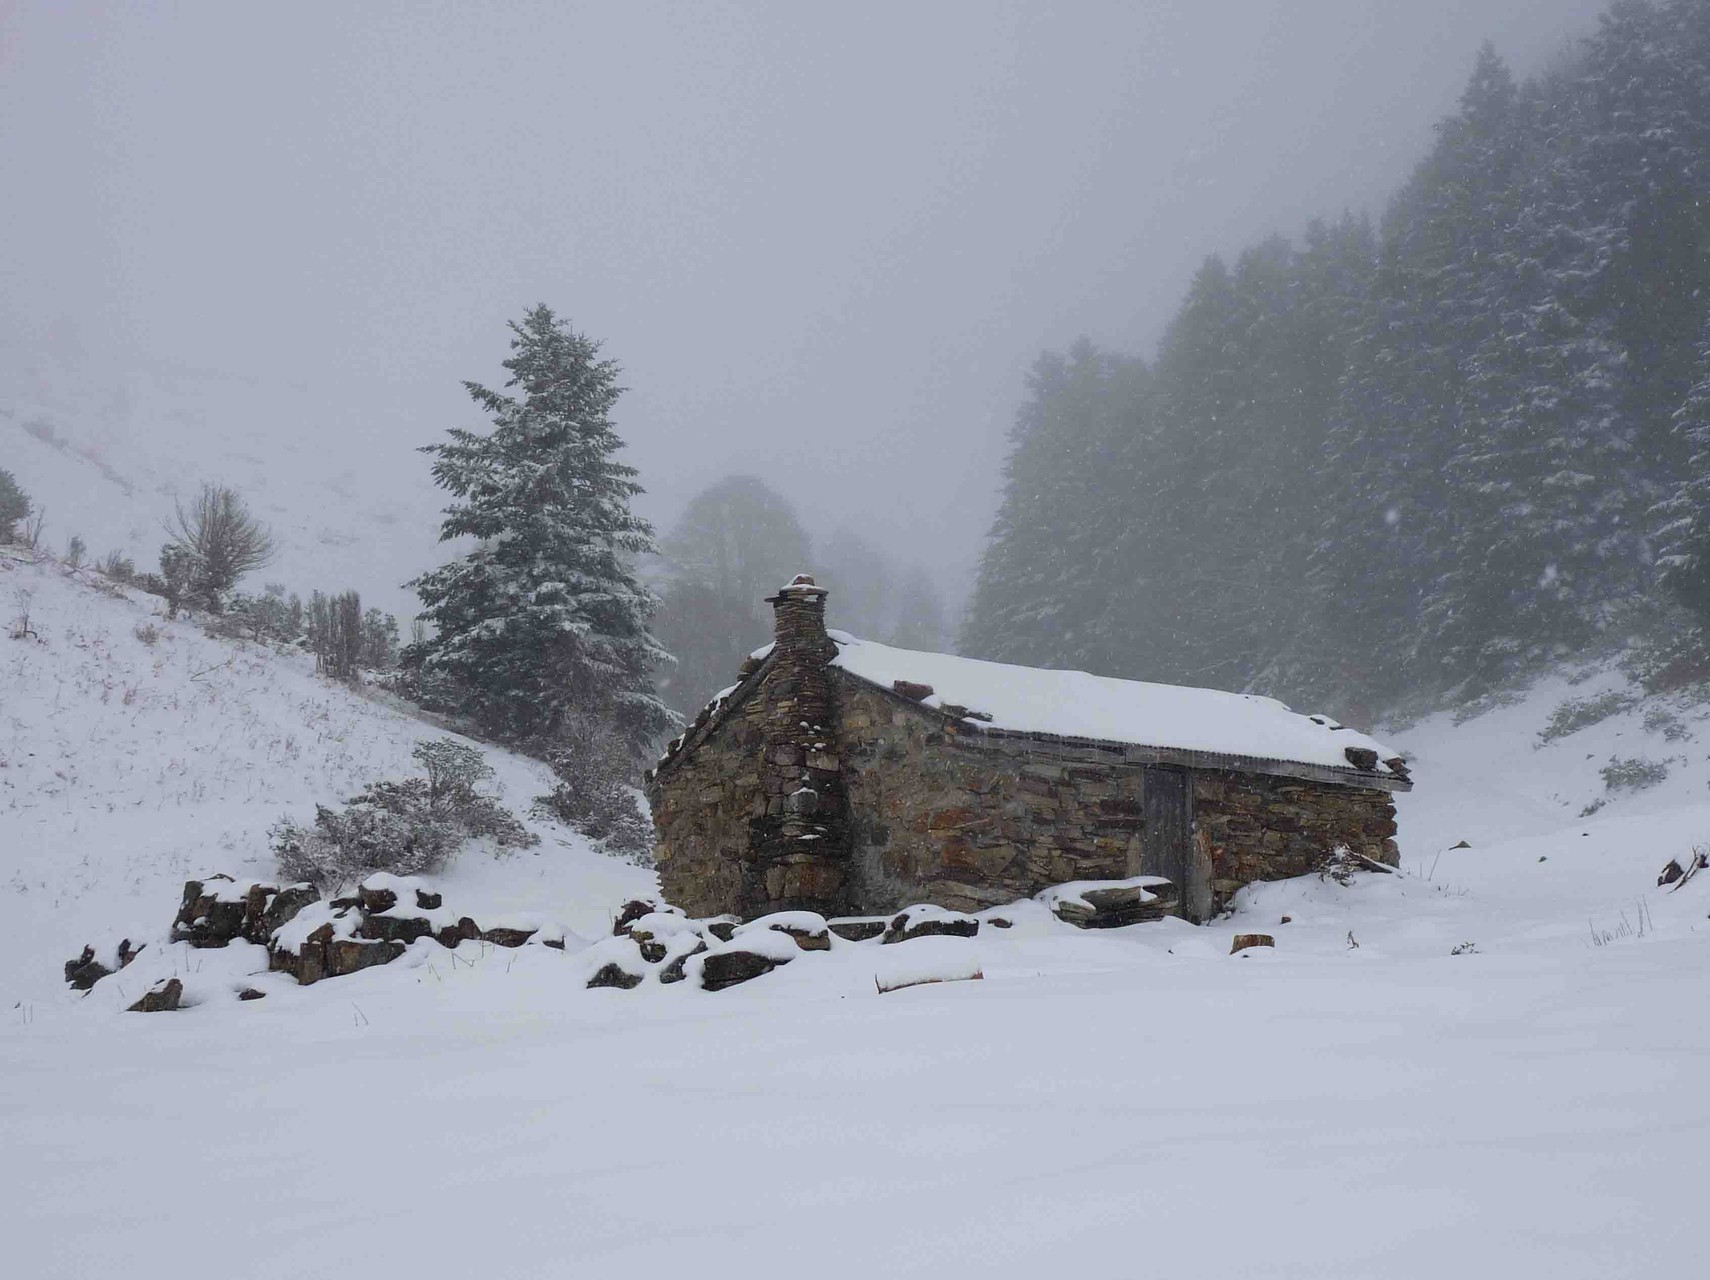 Un joli cadre montagnard, l'abri du berger à la Hosse